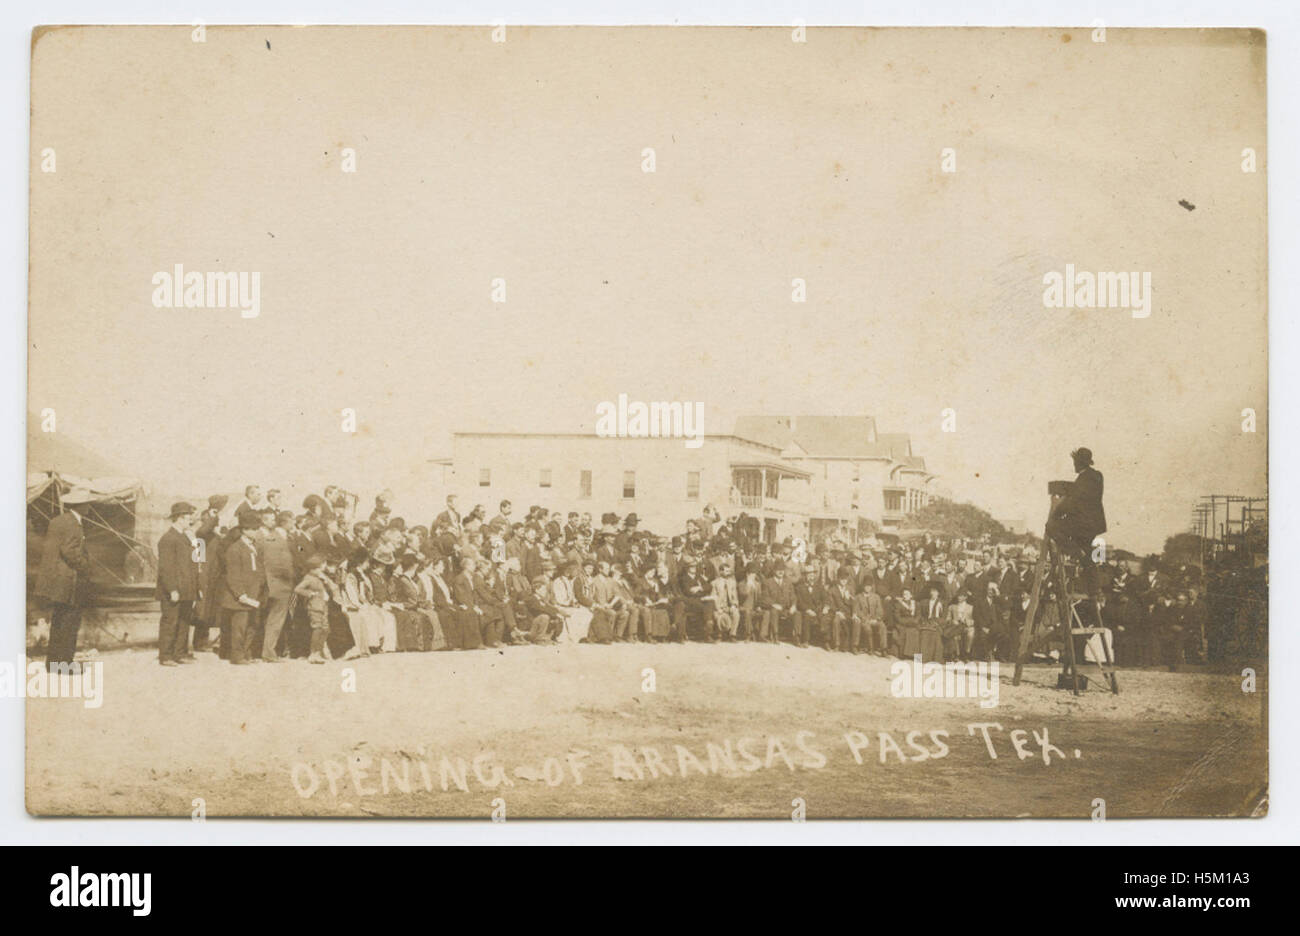 Opening of Aransas Pass, Tex - Stock Image